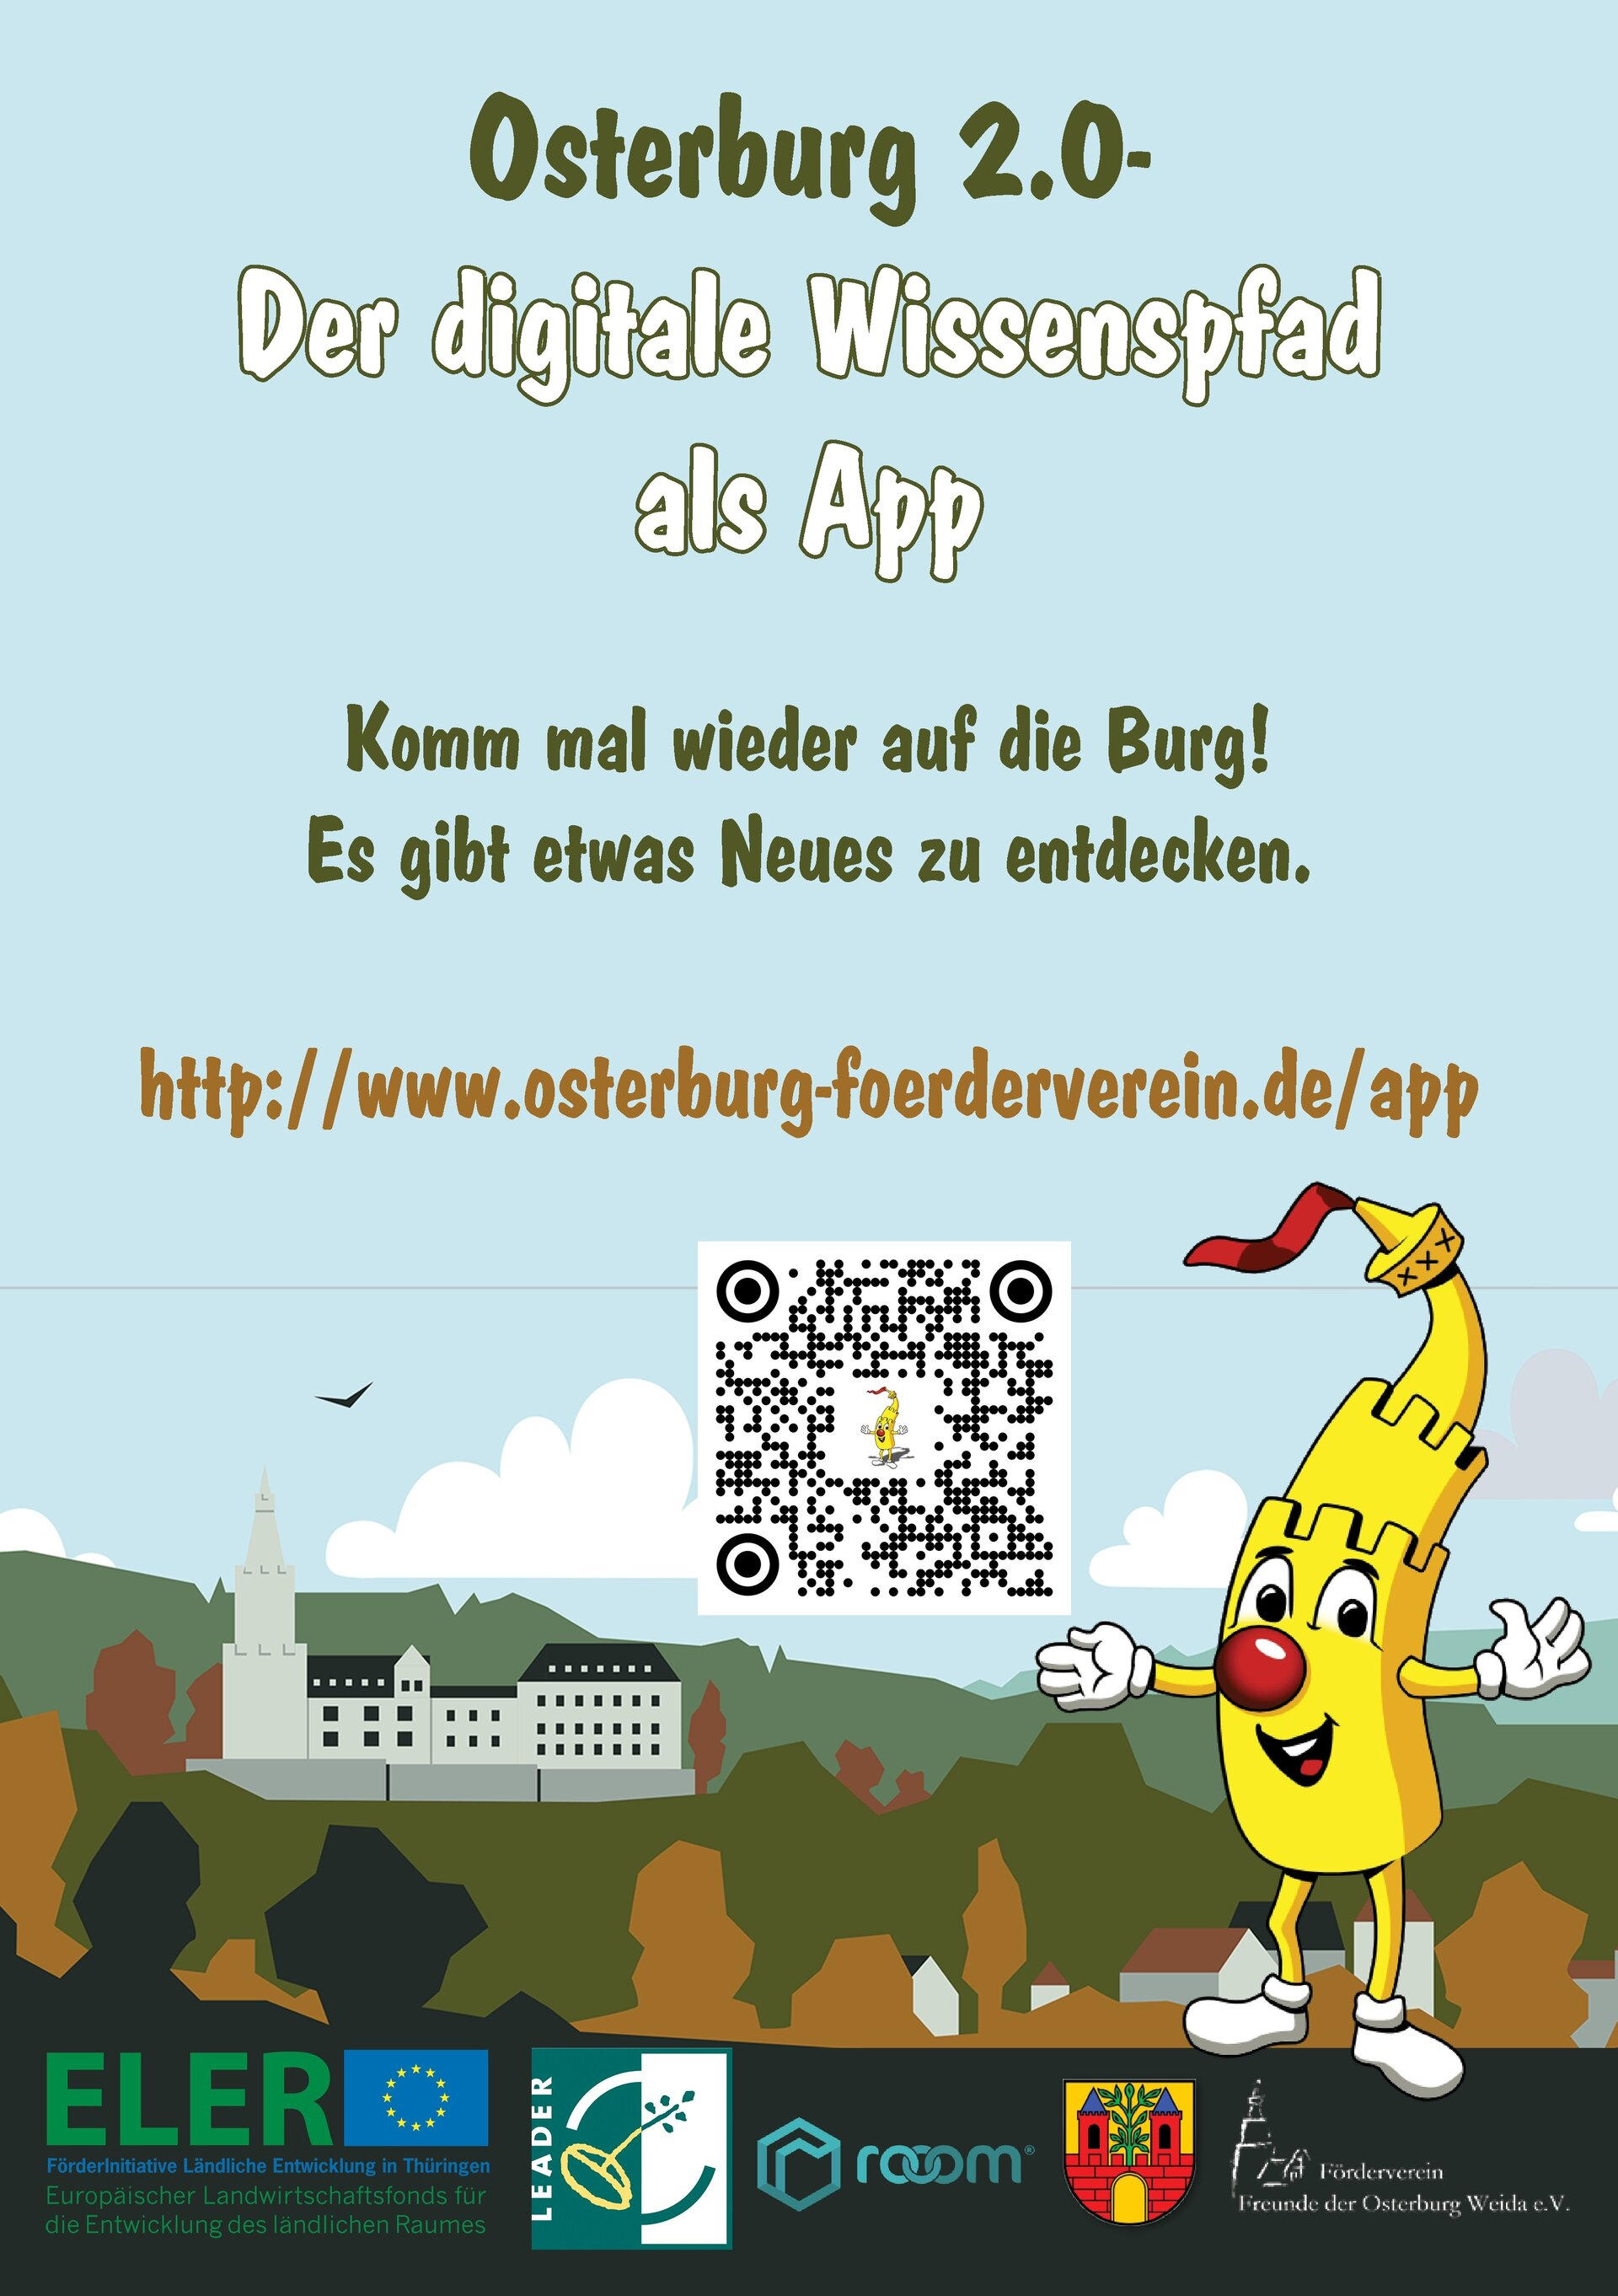 Osterburg 2.0 App